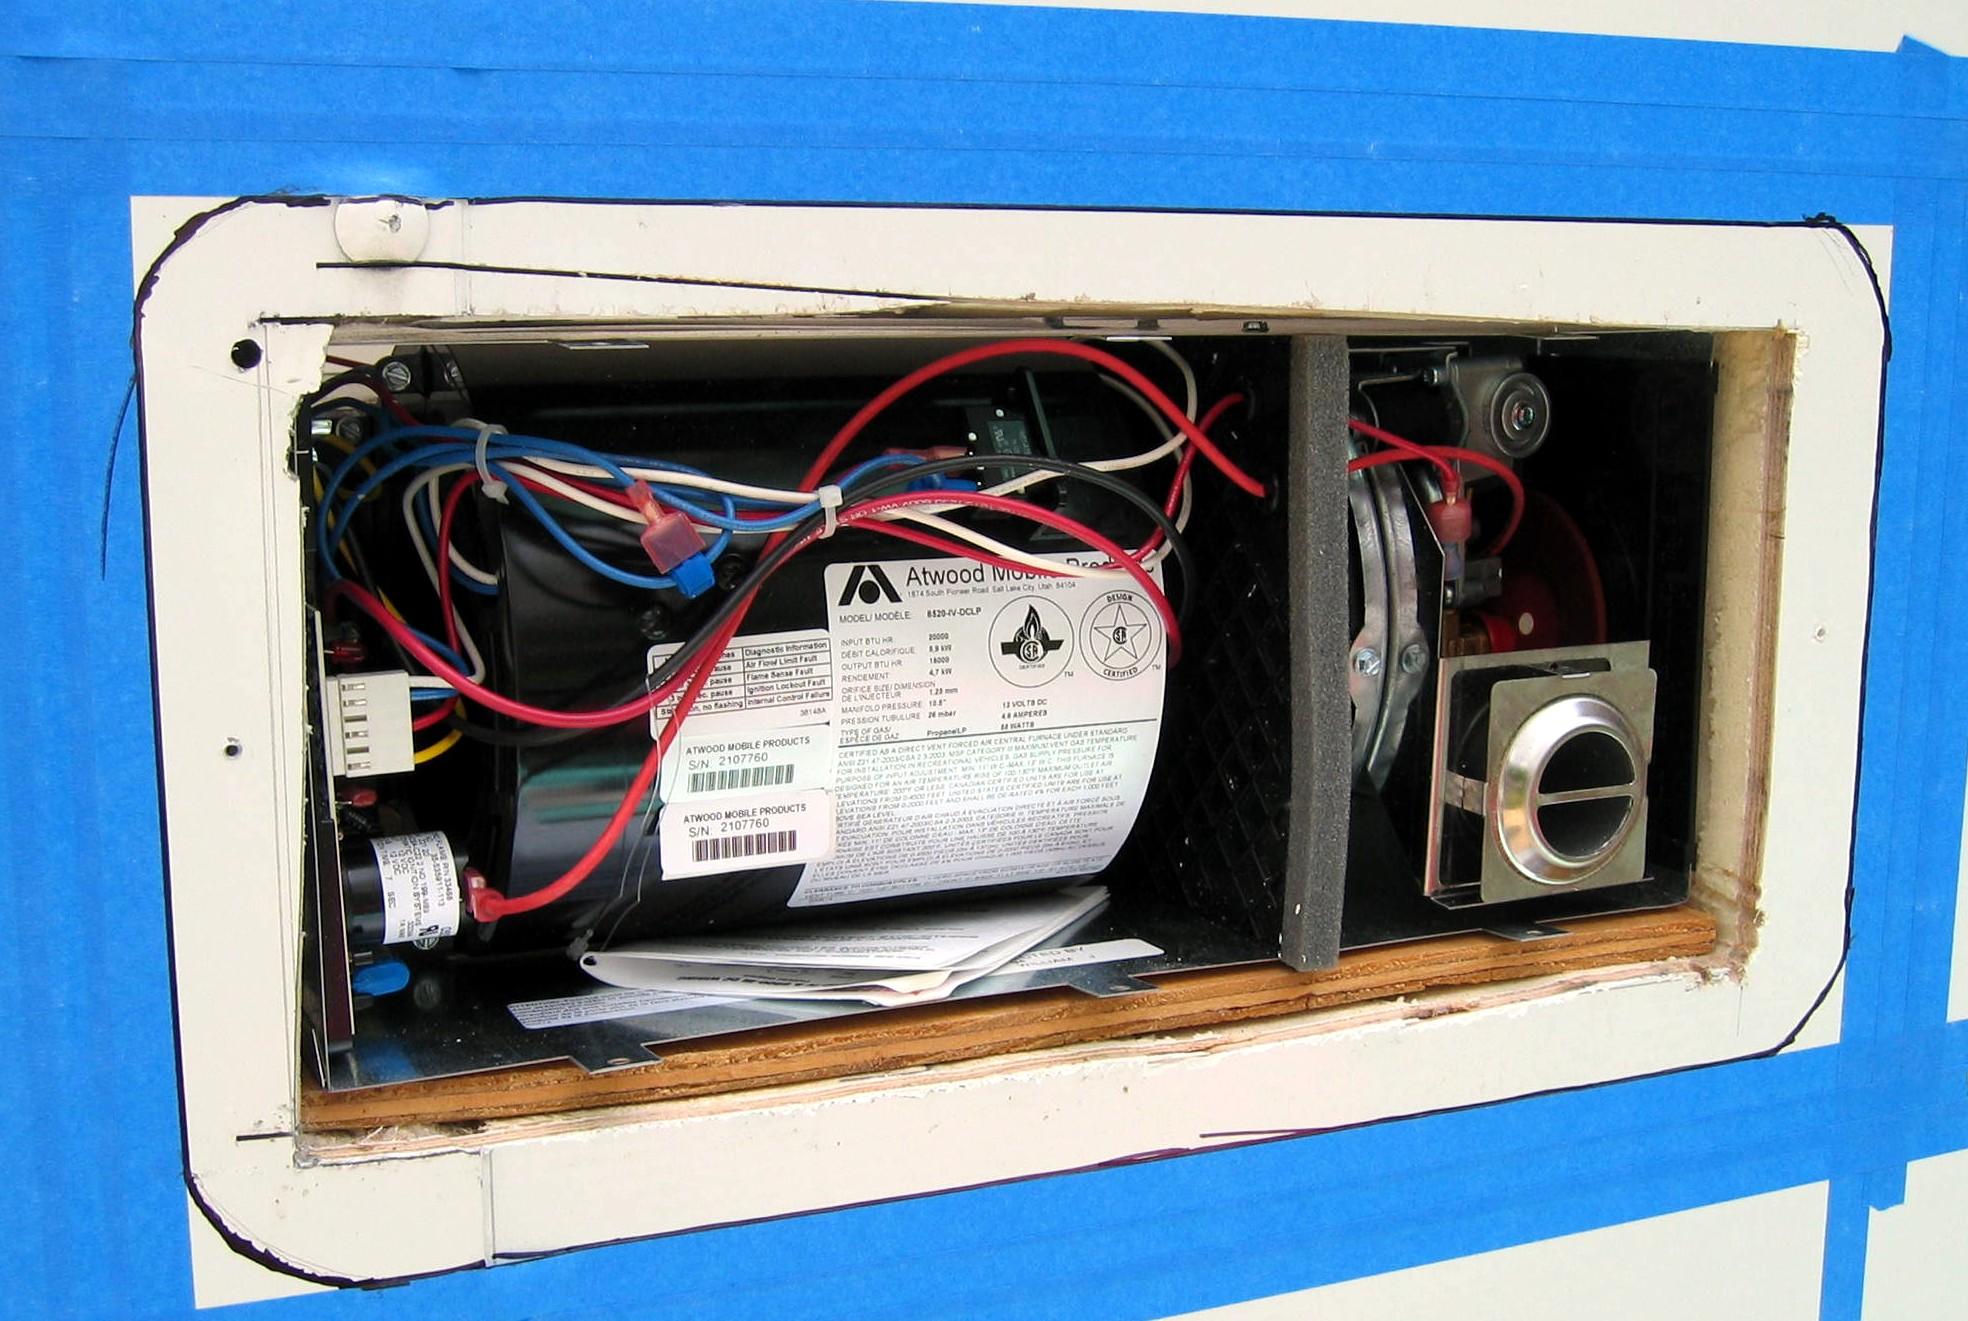 VX_3458] 8940 Troubleshoot Atwood Rv Furnaces Wiring Diagrams Schematic  WiringBdel Tron Syny Strai Joami Kweca Norab Gue45 Mohammedshrine Librar Wiring  101